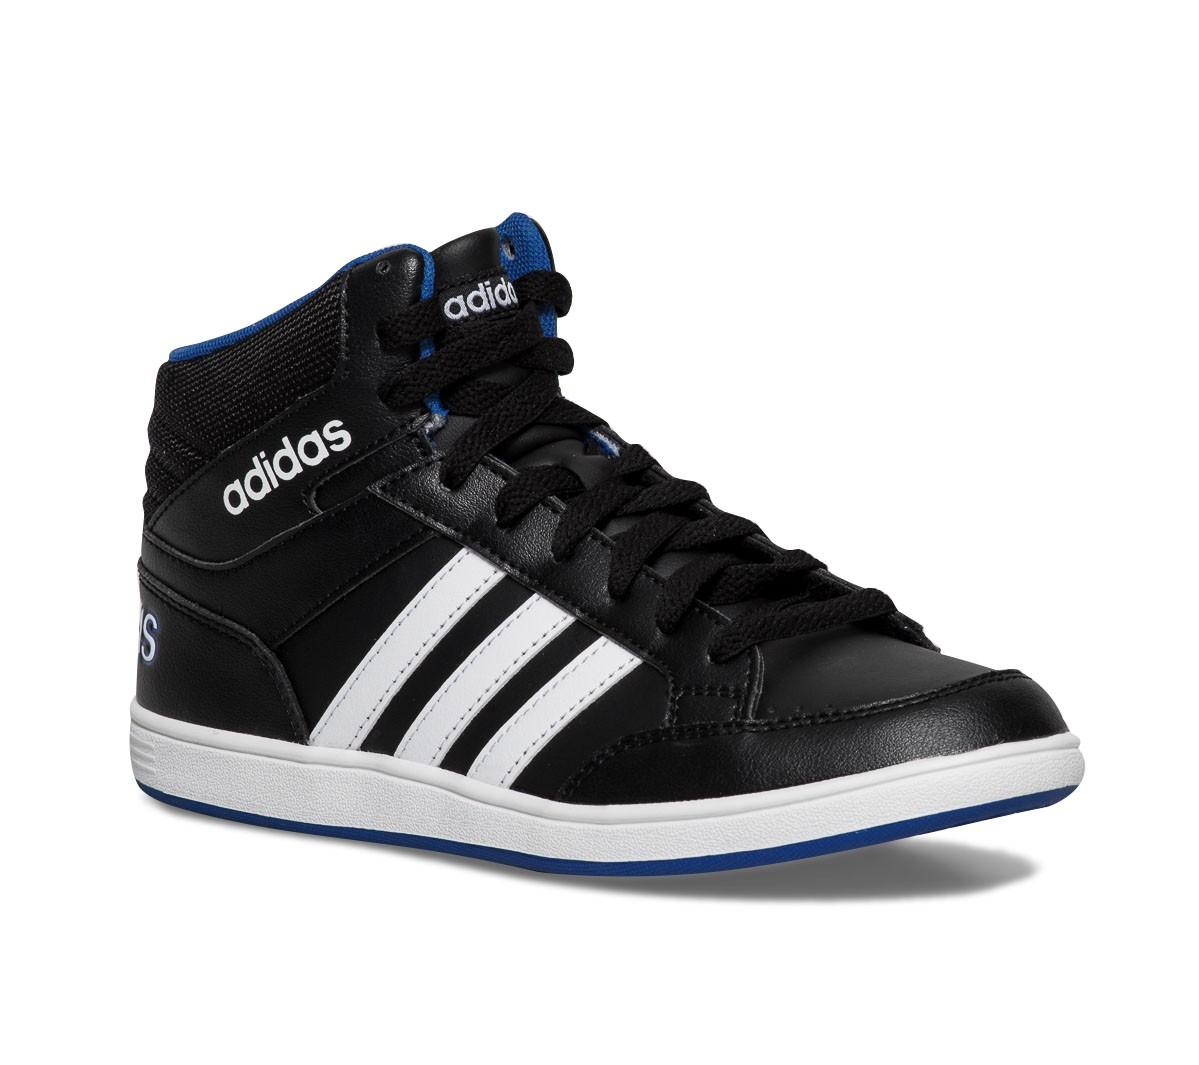 Magasin Outlet pour basket adidas montant garcon pas cher - mes ... dad4abe56476